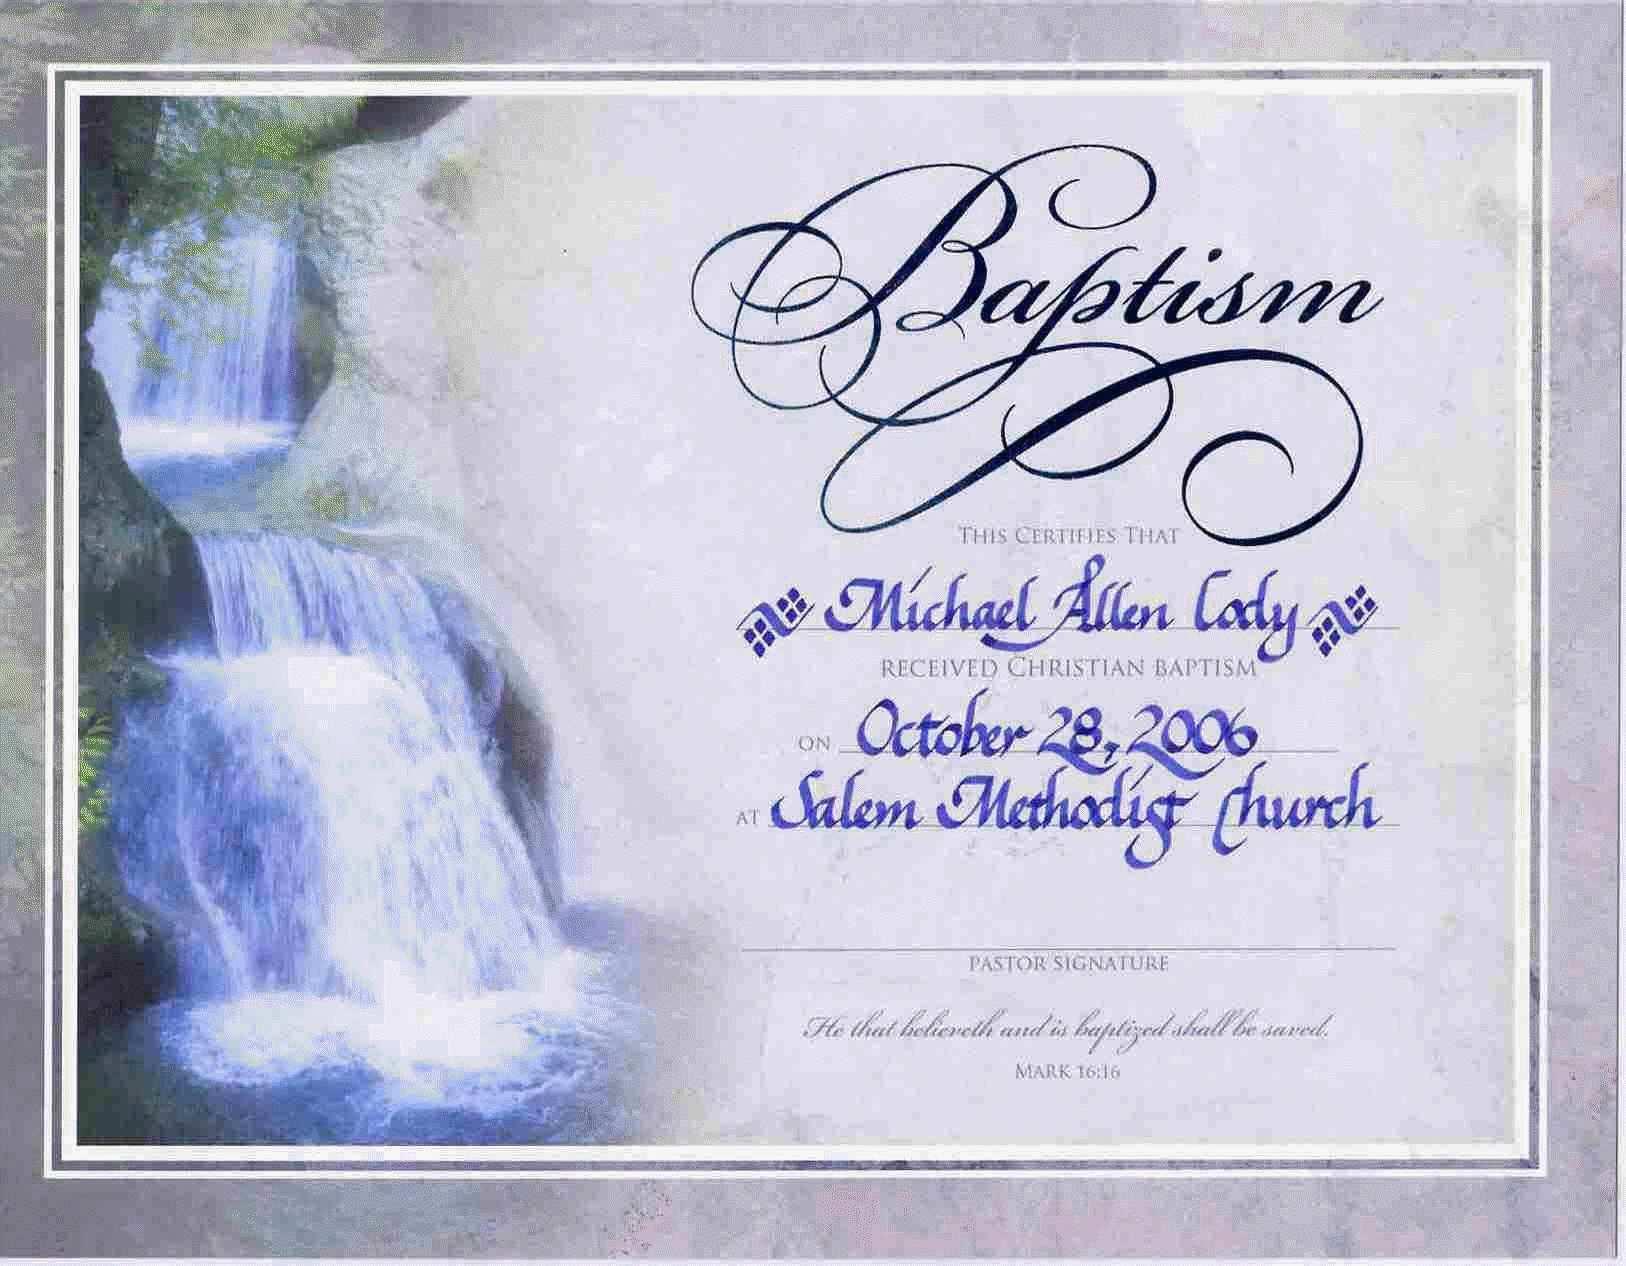 Free Printable Baptism Certificate Simple Water Baptism Certificate - Free Online Printable Baptism Certificates